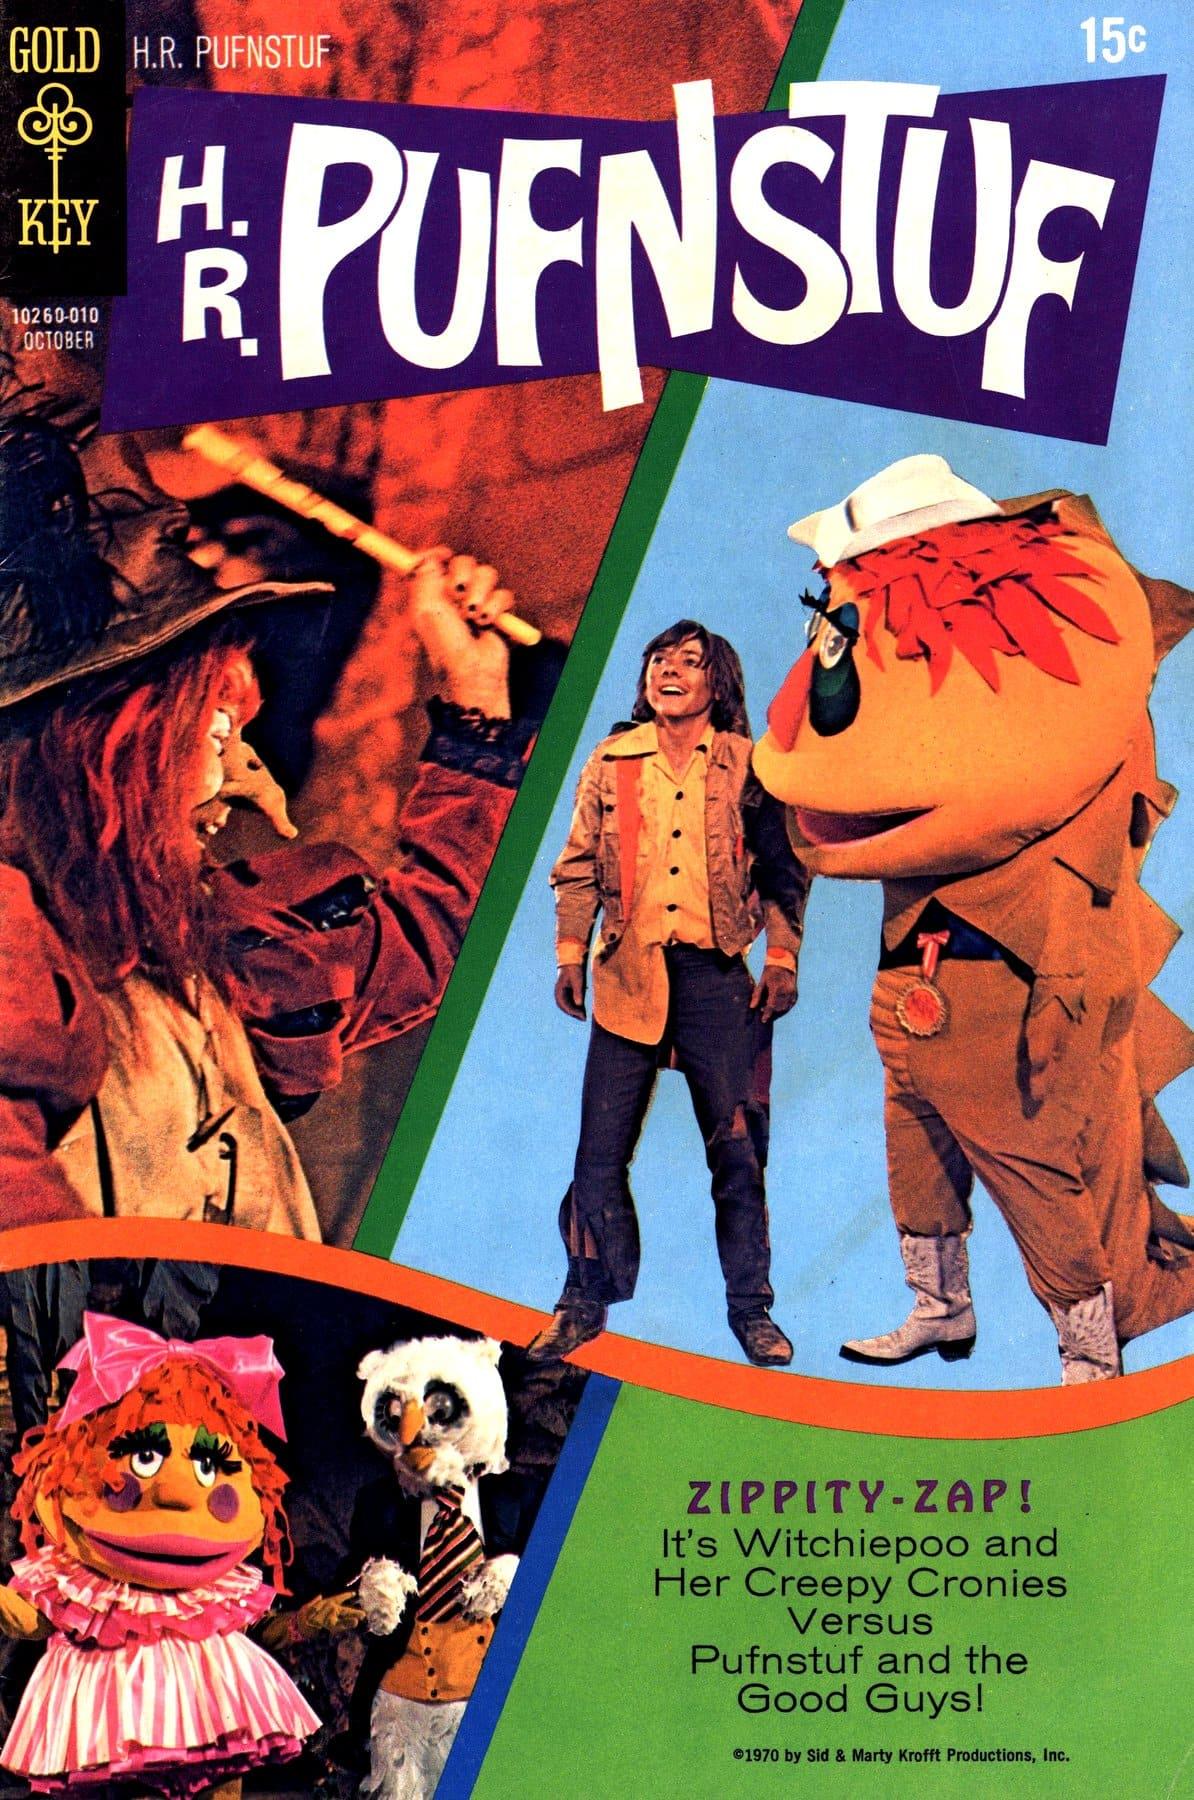 H. R. Pufnstuf comic book cover (1970)